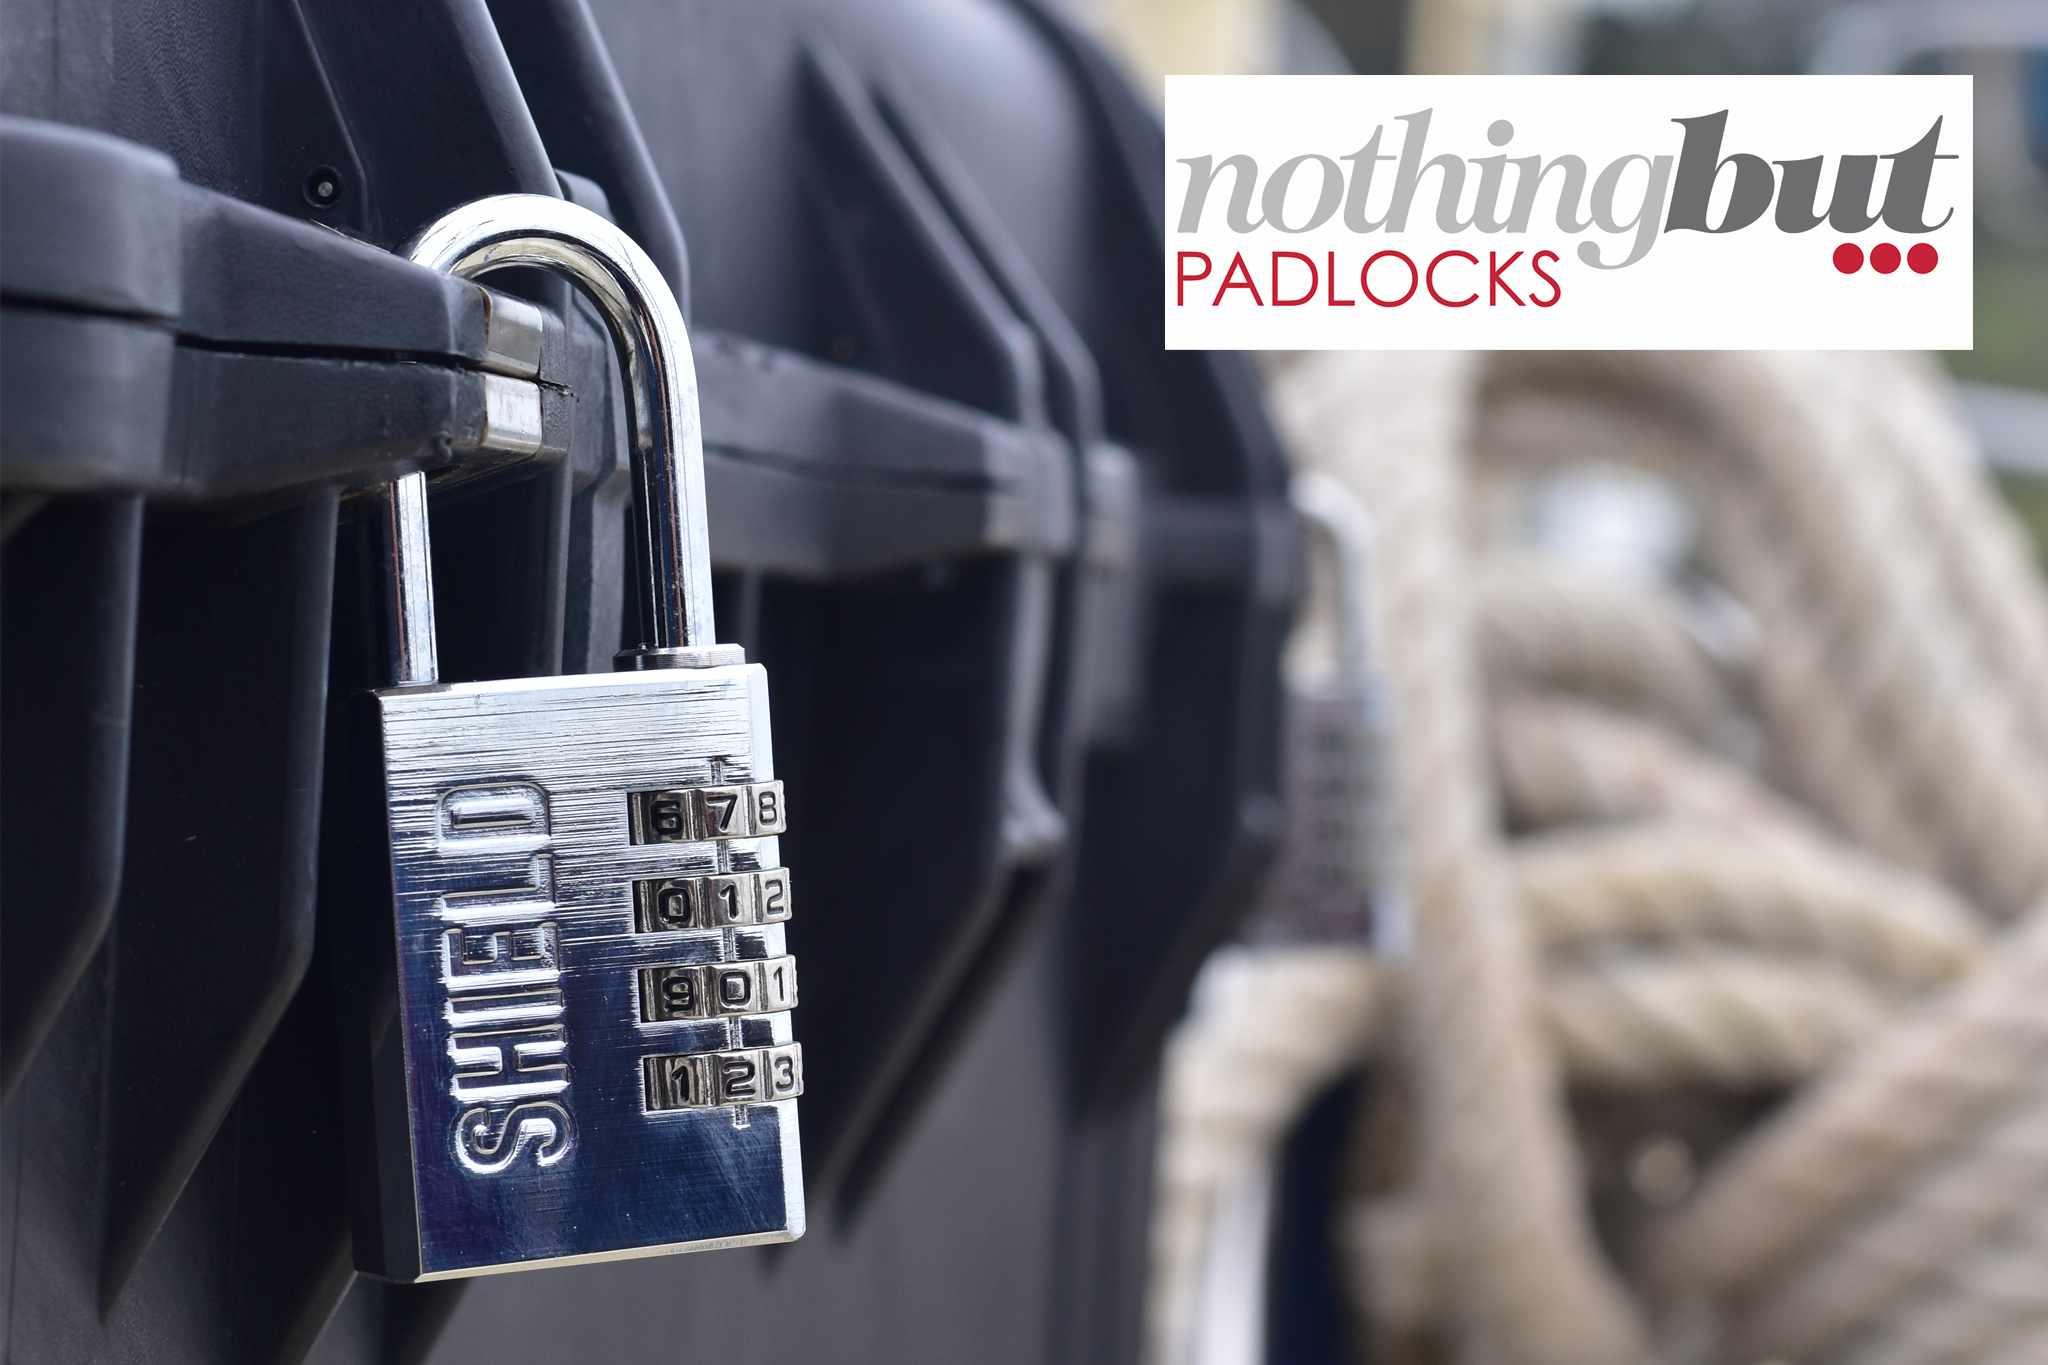 Win a padlock bundle from Nothing But Padlocks